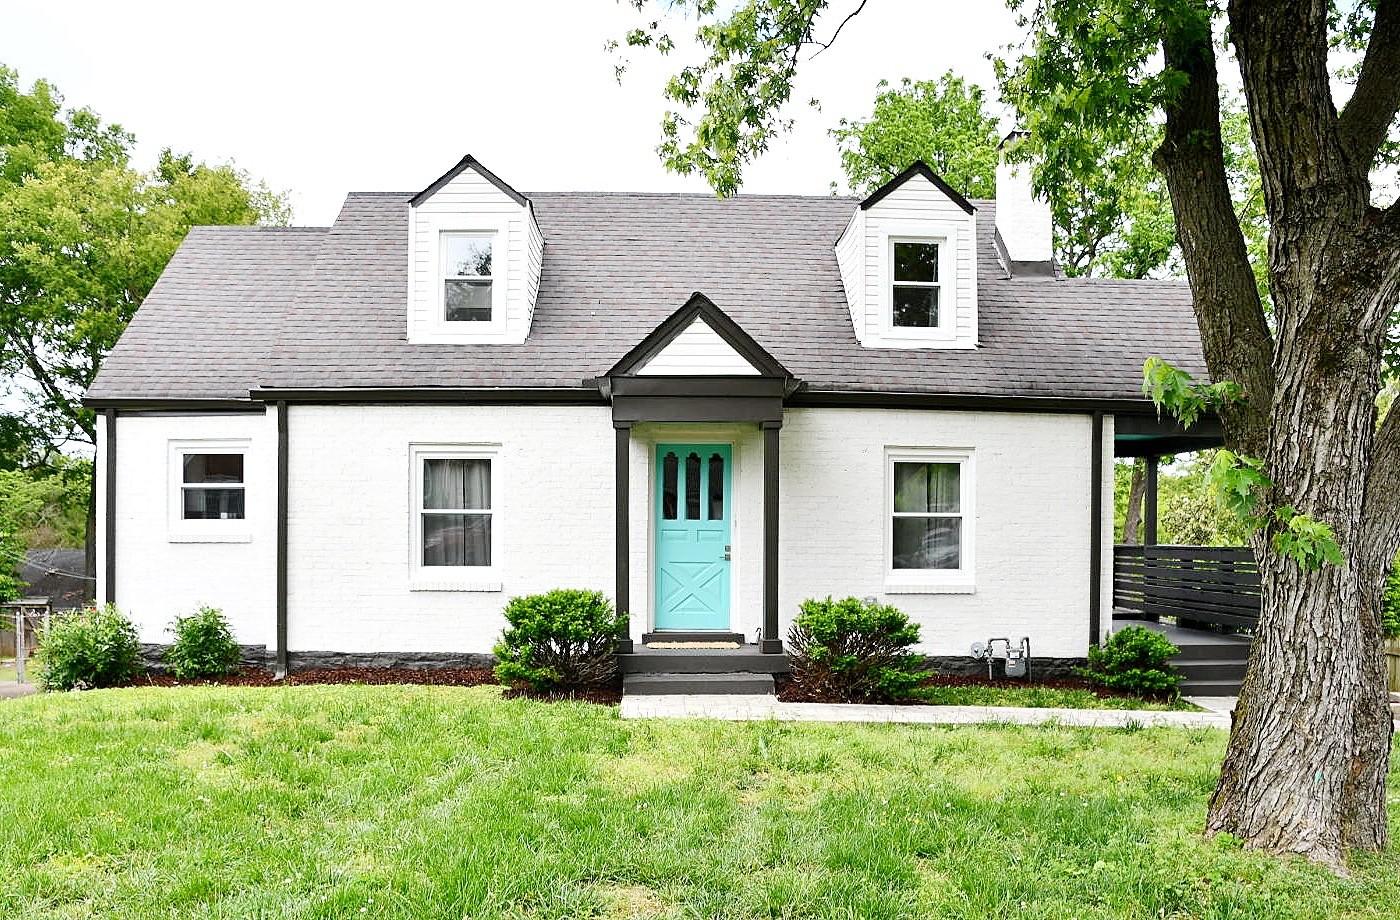 Sunnymeade Homes For Sale Nashville TN